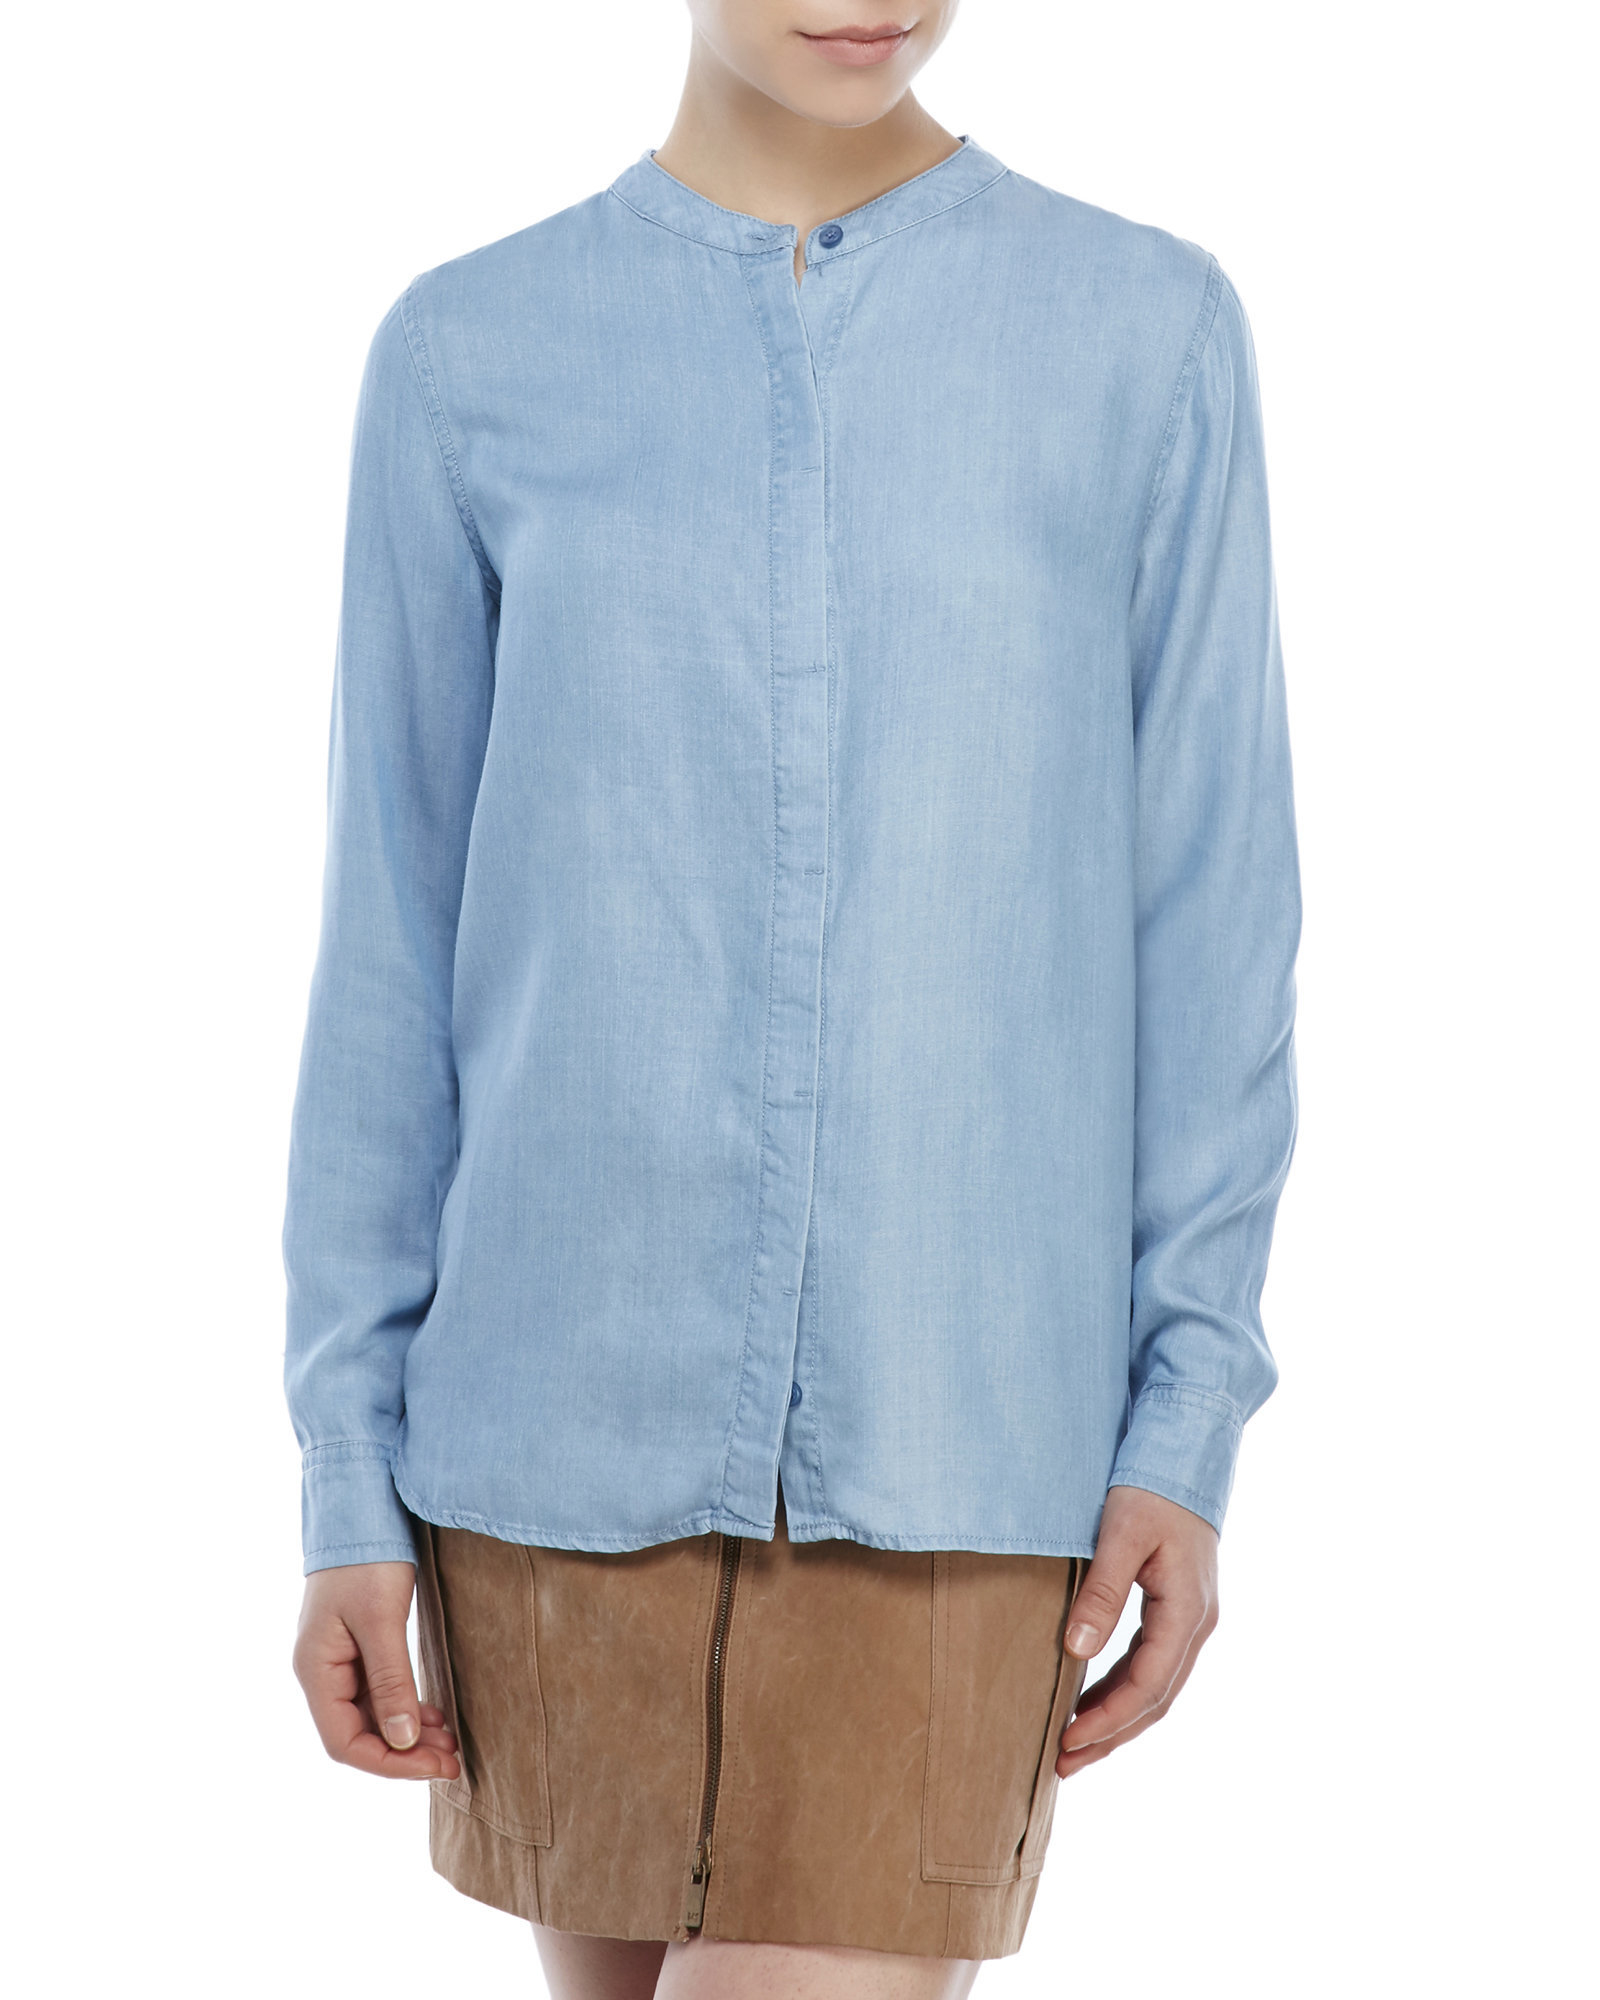 century 21 mandarin collar button up shirt in blue medium